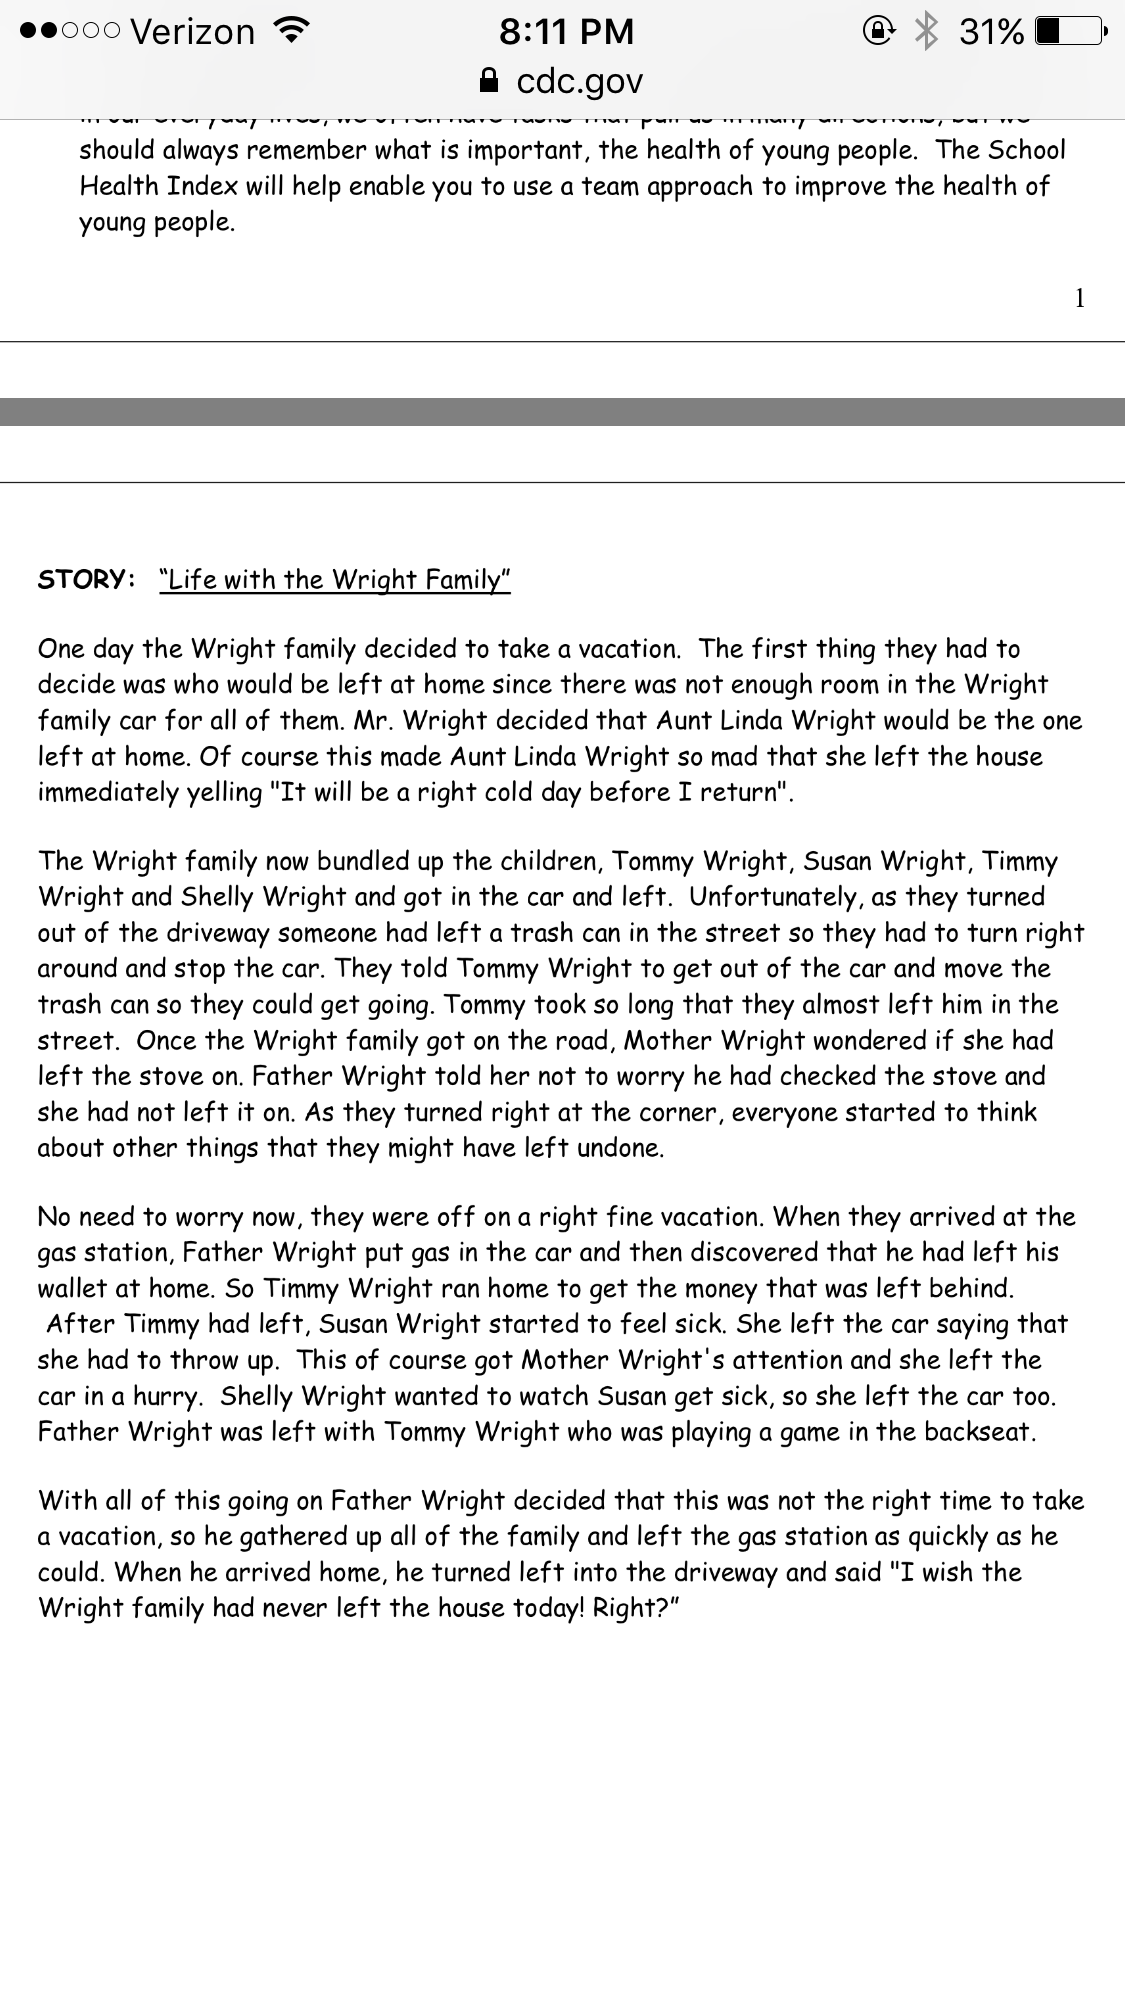 christmas gift exchange story poem | Dealssite.co